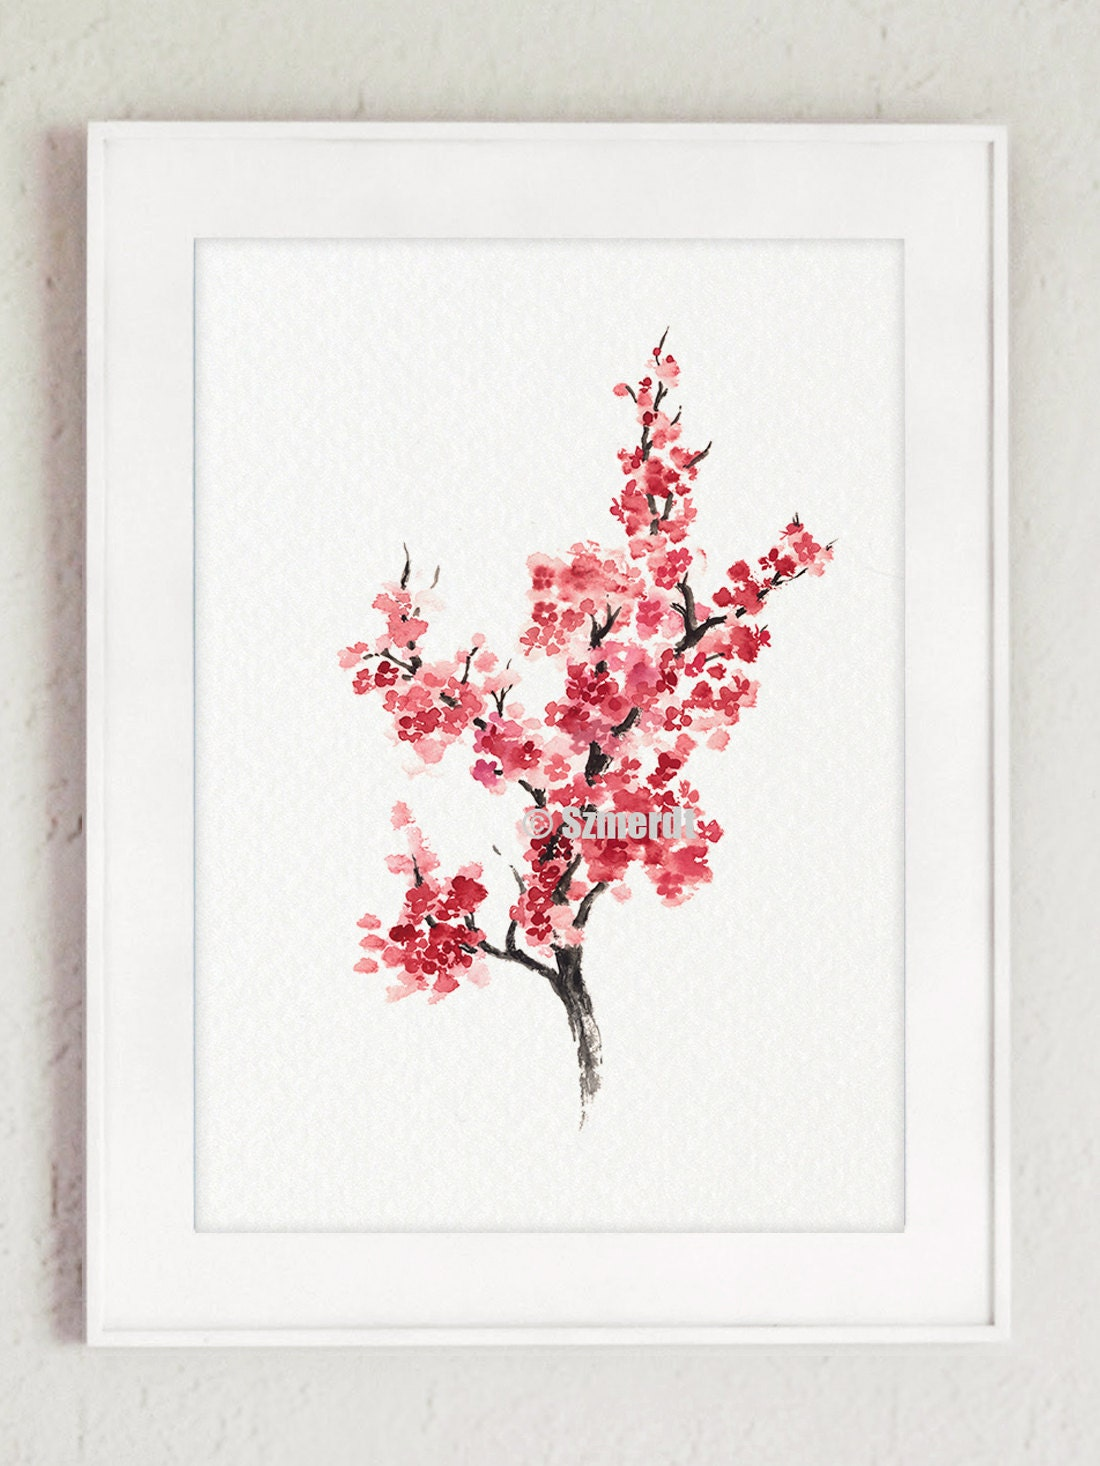 Https Www Etsy Com Listing 240508672 Cherry Blossom Tree Sakura Home Decor